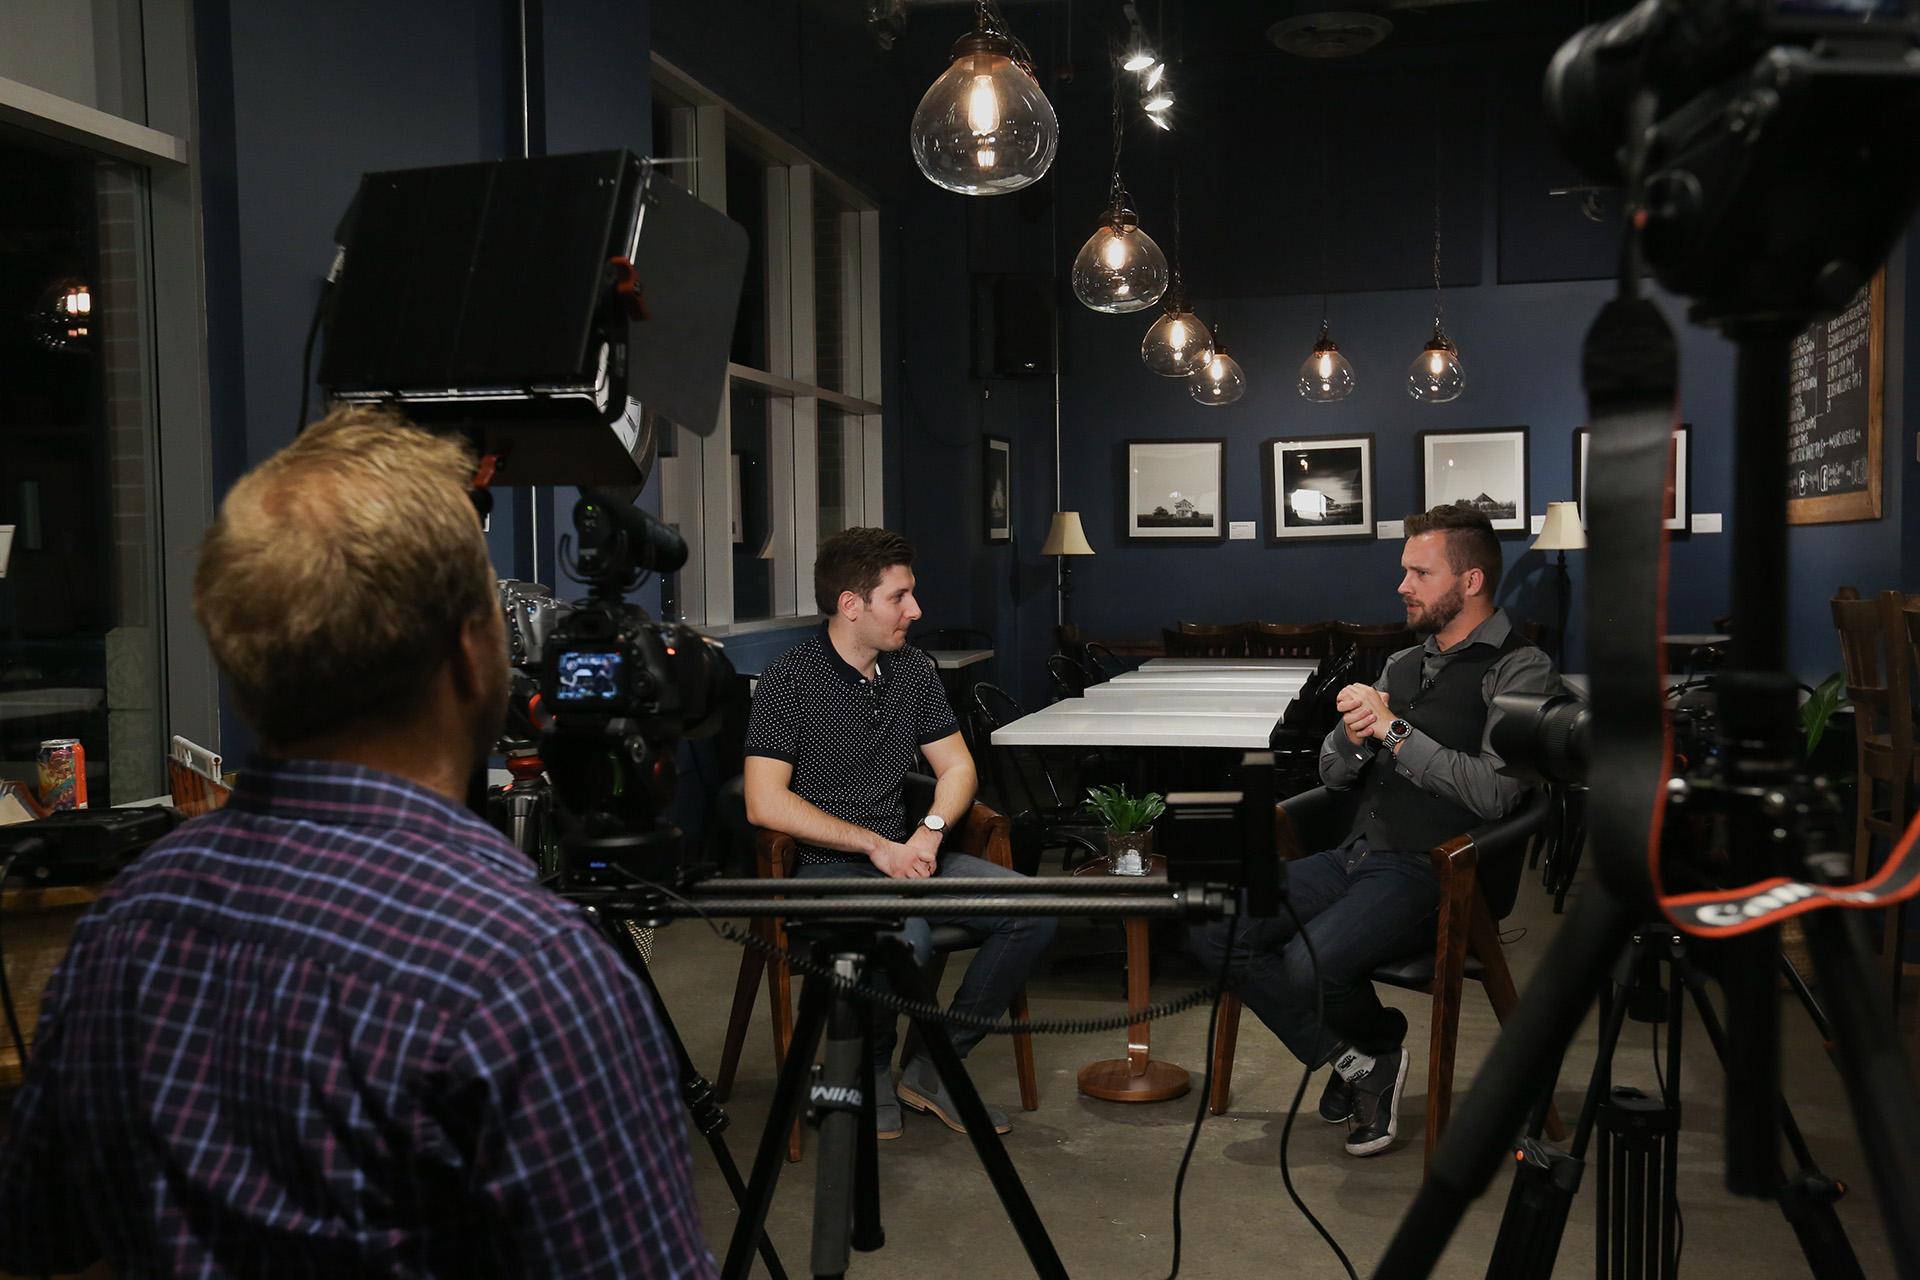 Boris Vujanovic on The Ambition Project